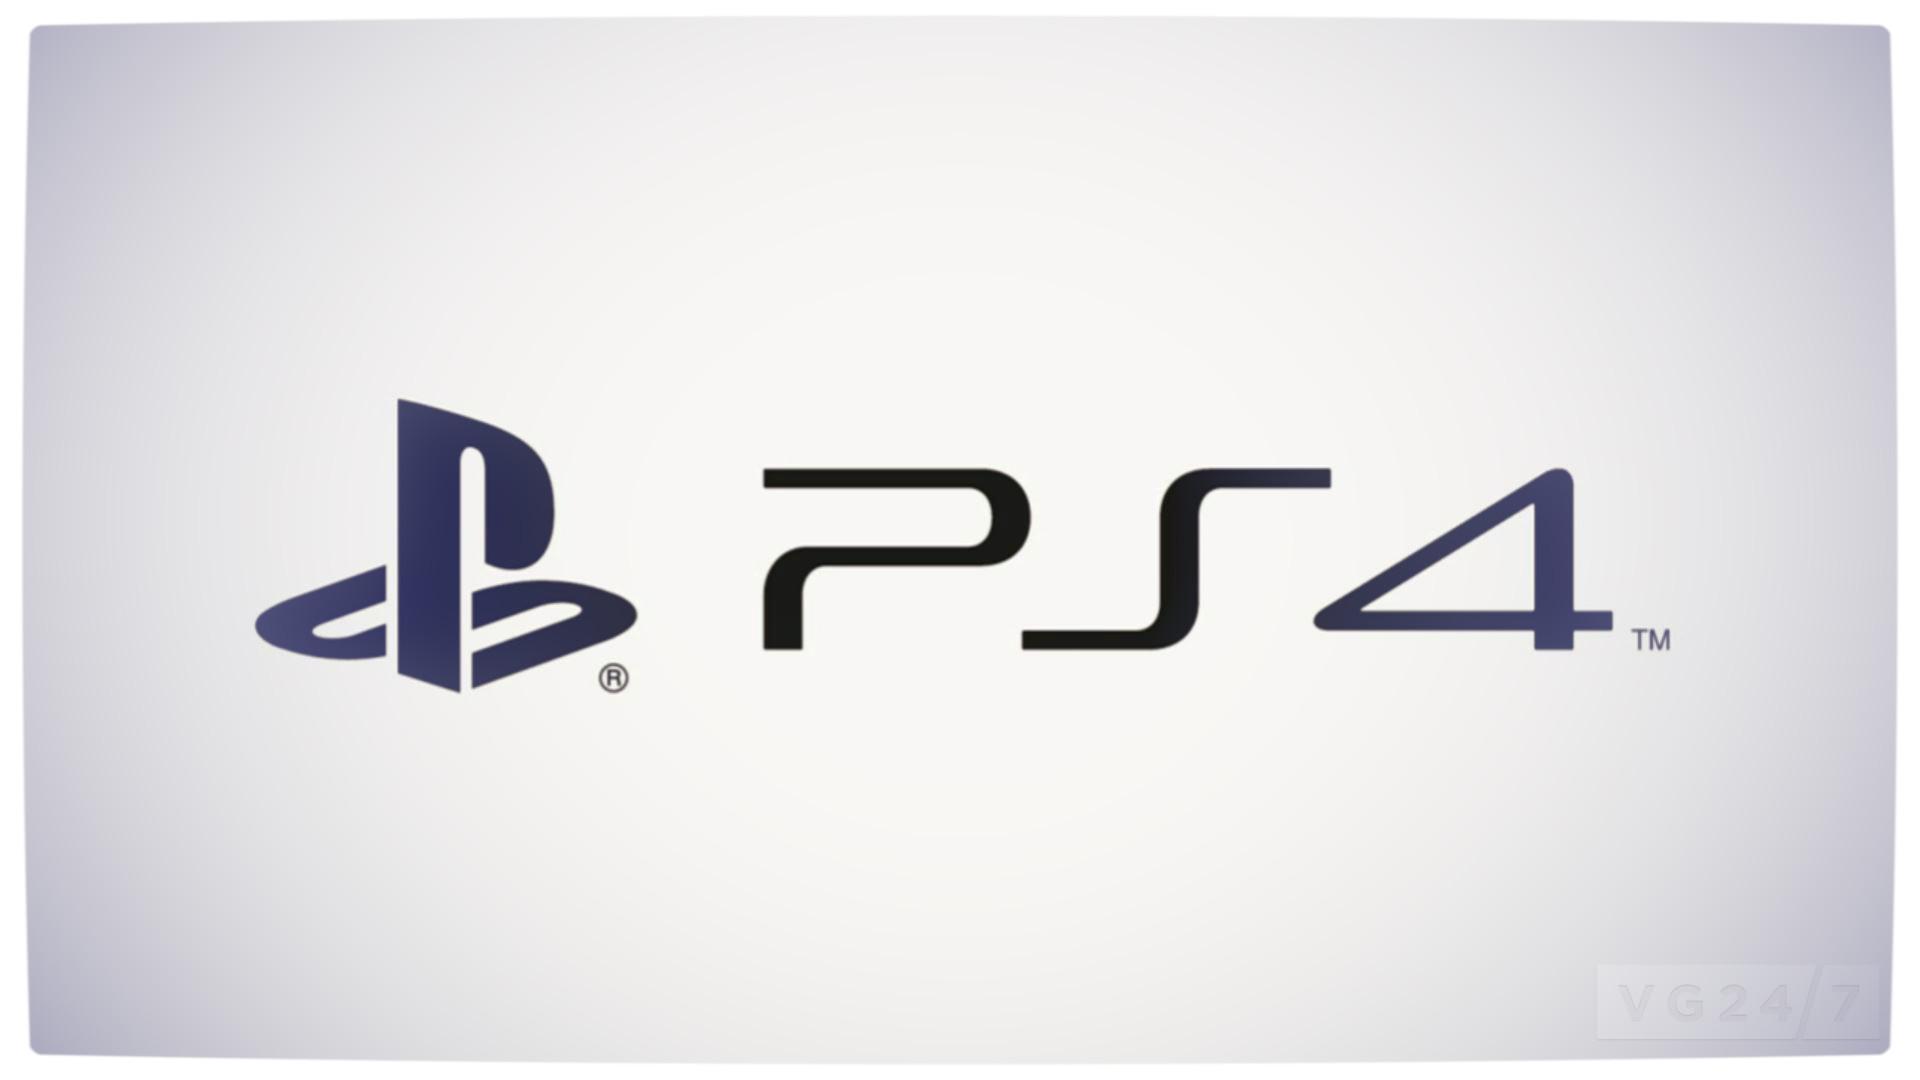 72 Playstation 4 Wallpaper Hd